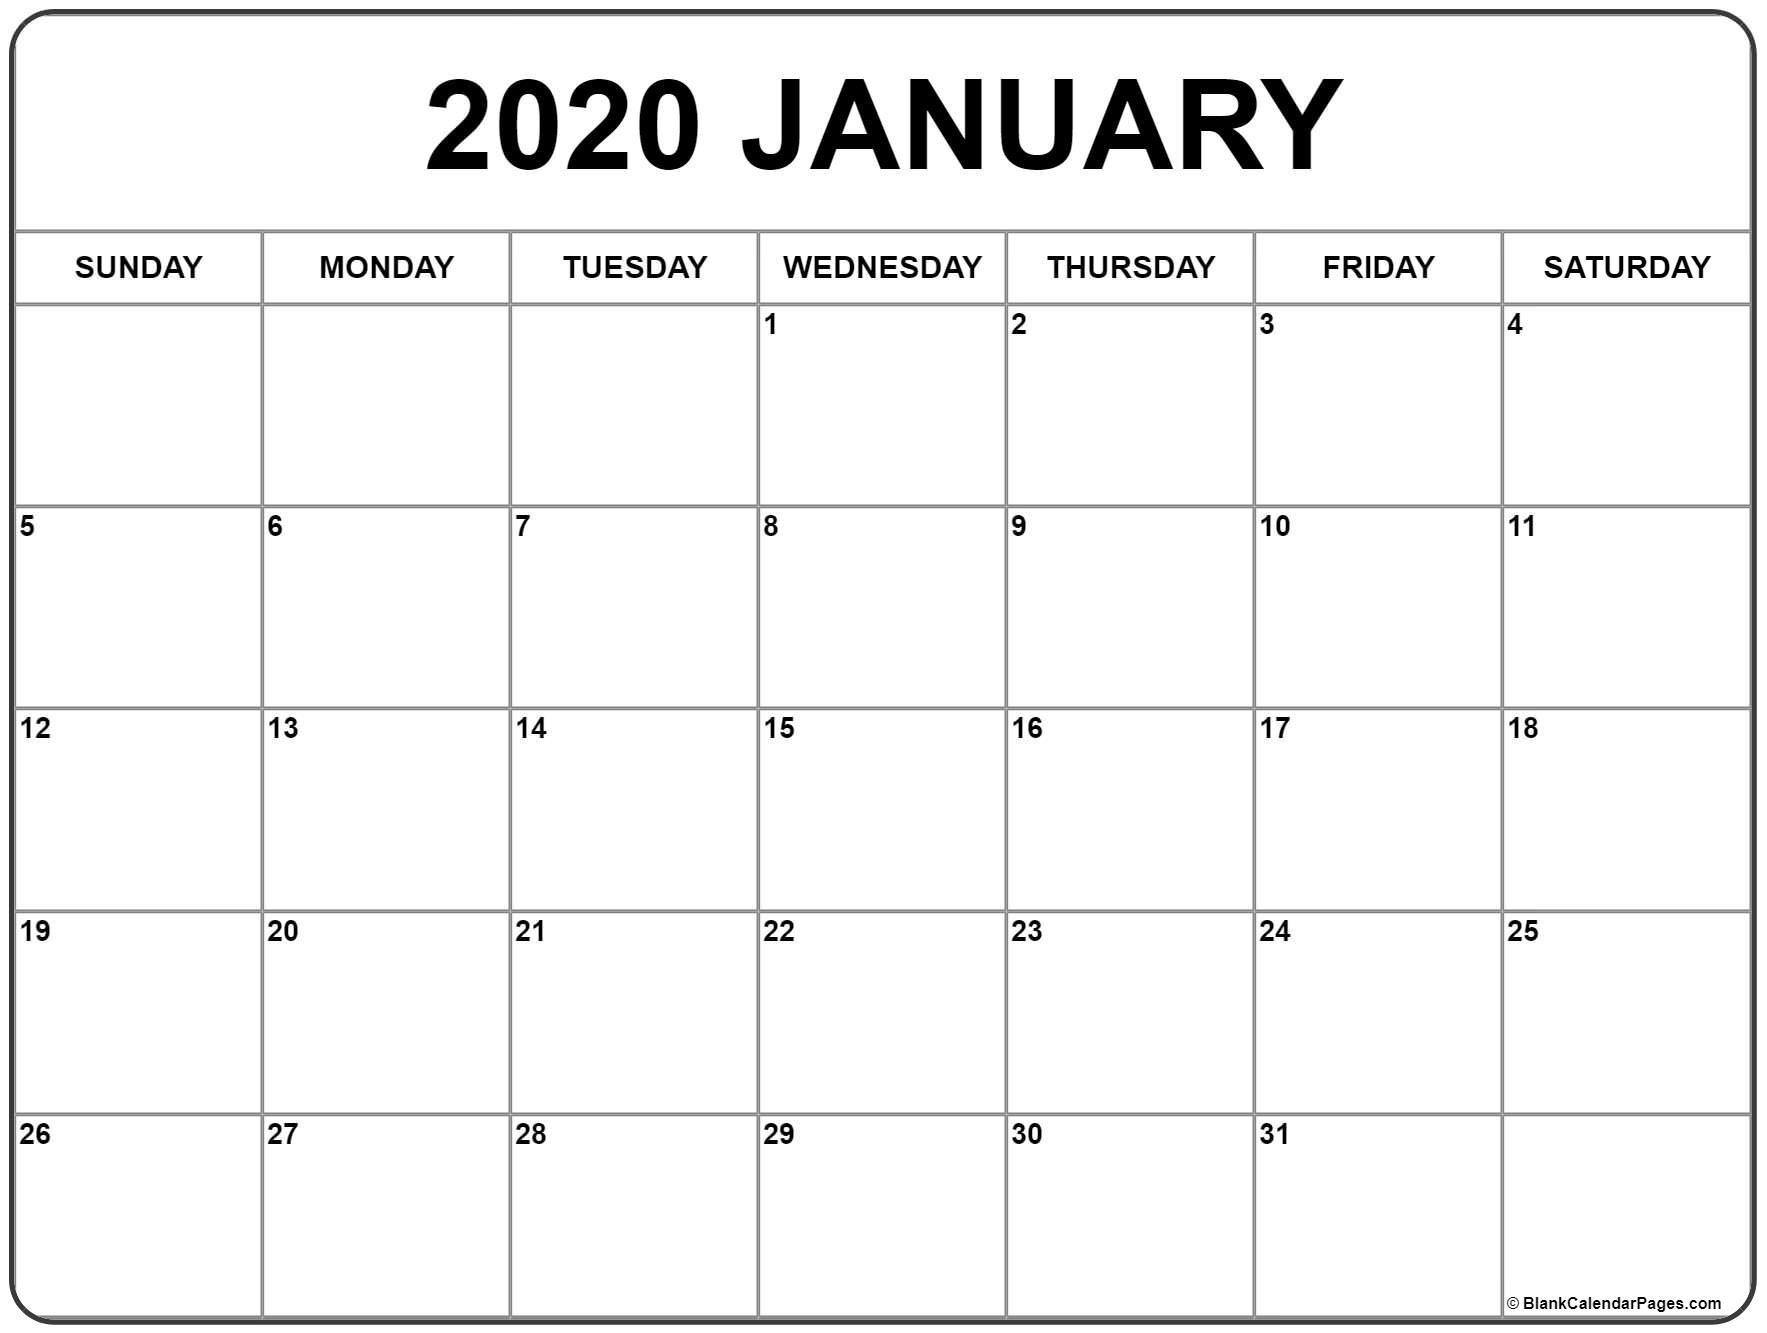 003 Stunning Word 2020 Monthly Calendar Template Image  Uk FreeFull